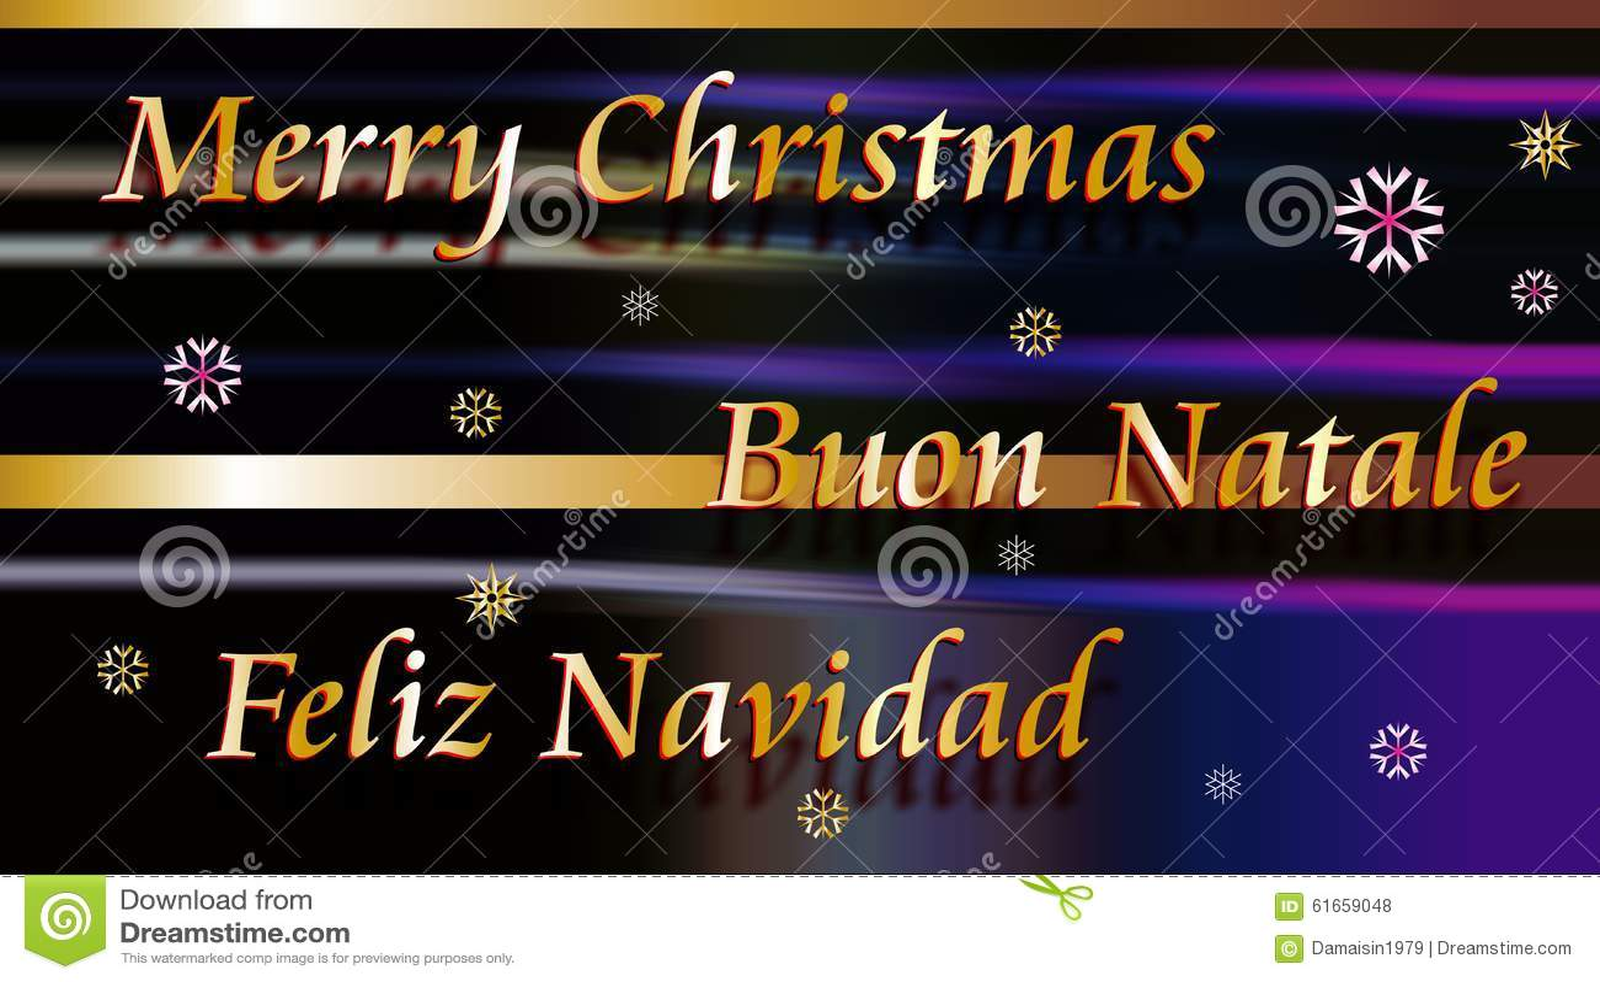 Merry Christmas Buon Natale And Feliz Navidad Stock